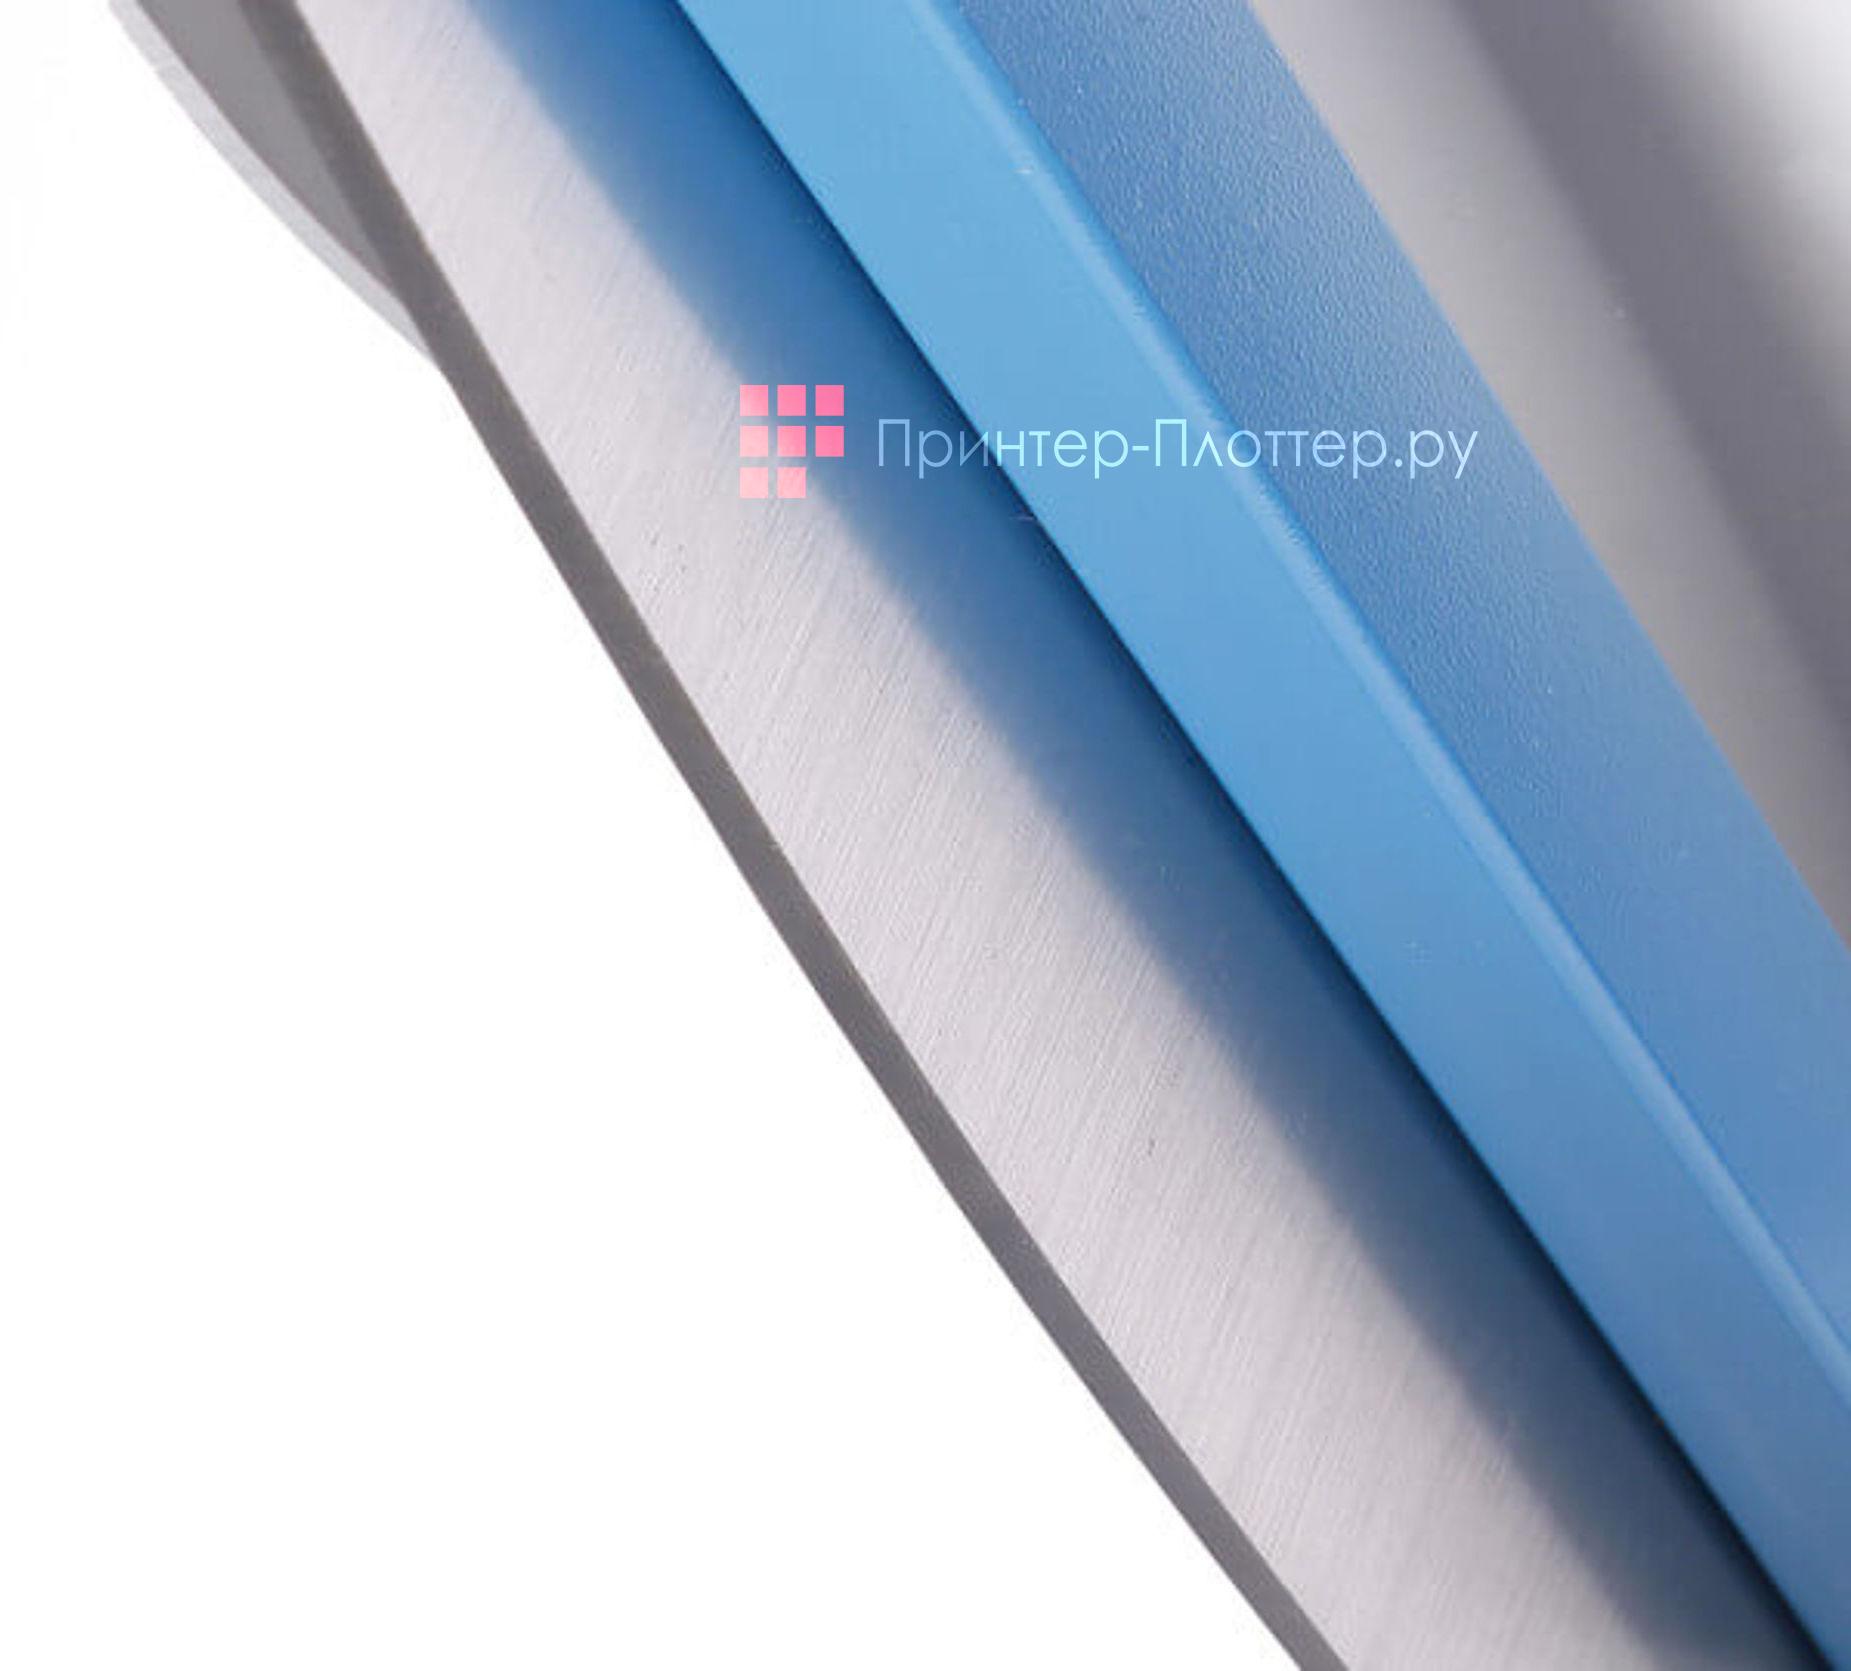 Dahle 867. Нож для материалов